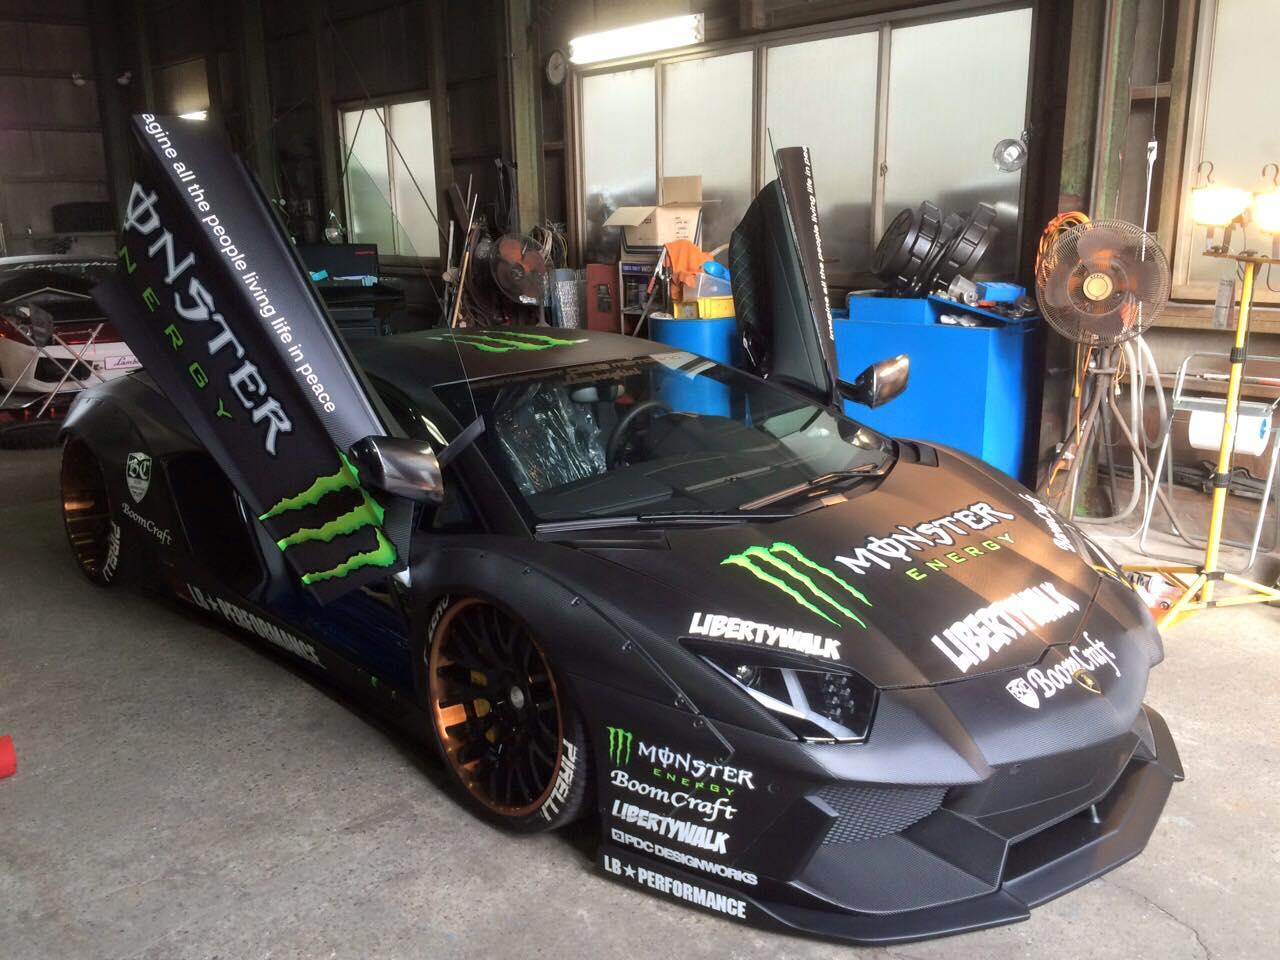 Widebody Drift Car Wallpaper Liberty Walk Lamborghini Aventador With Monster Livery